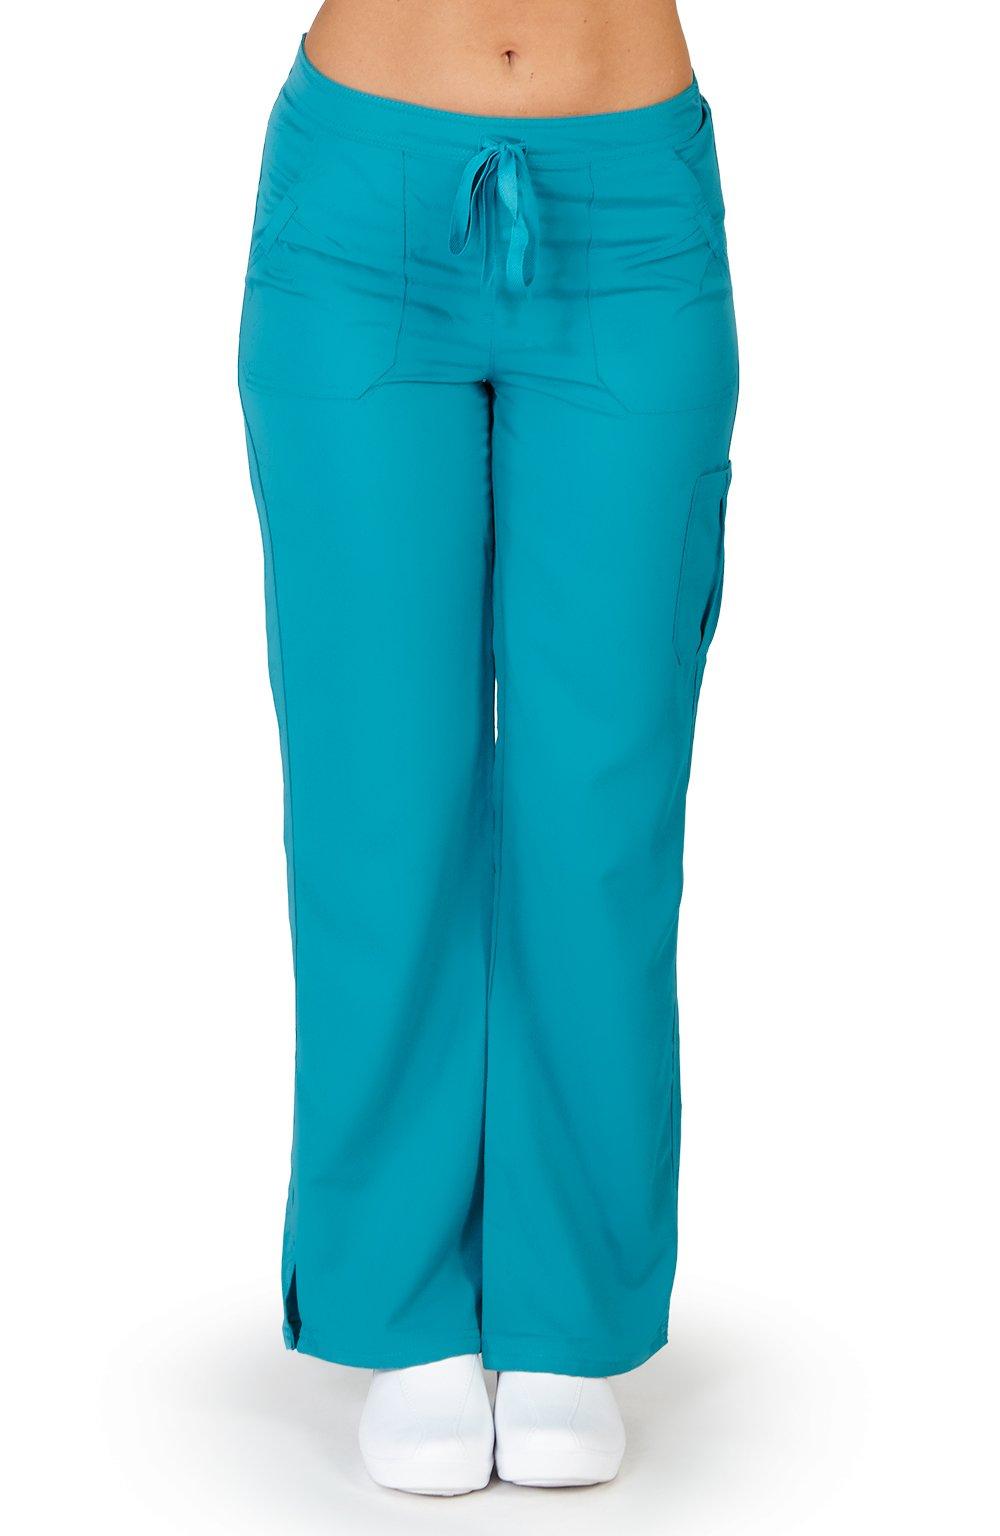 Ultra Soft Brand Scrubs - Premium Womens Junior Fit Cargo Pocket Scrub Pant, Teal 38489-X-Large